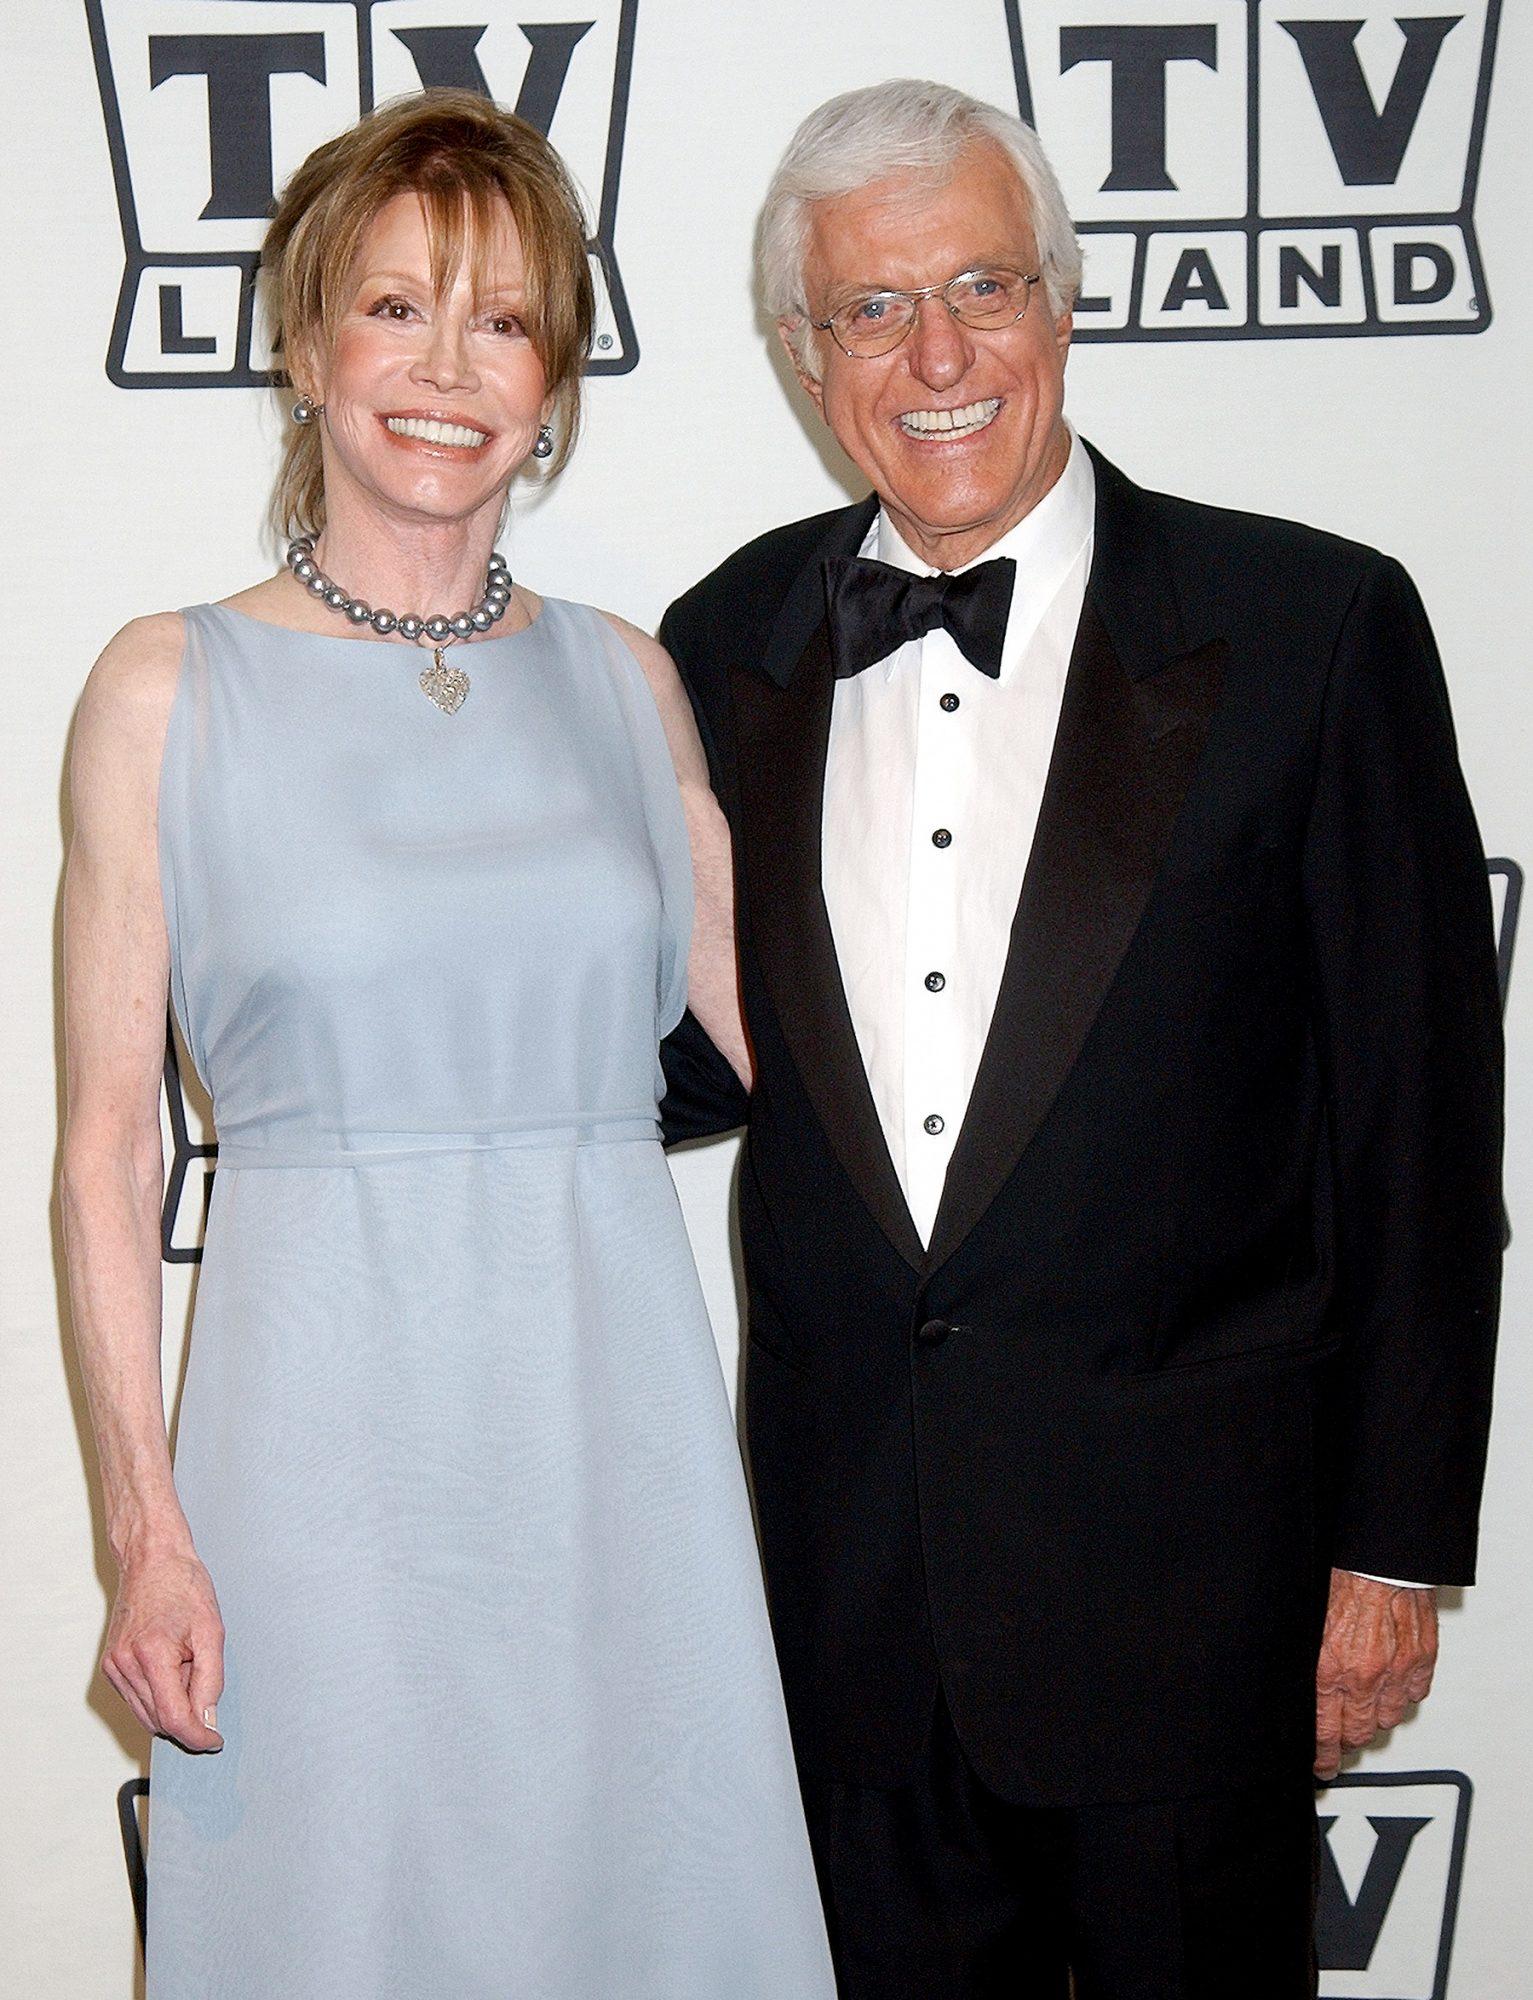 TV Land Awards: A Celebration of Classic TV - Press Room